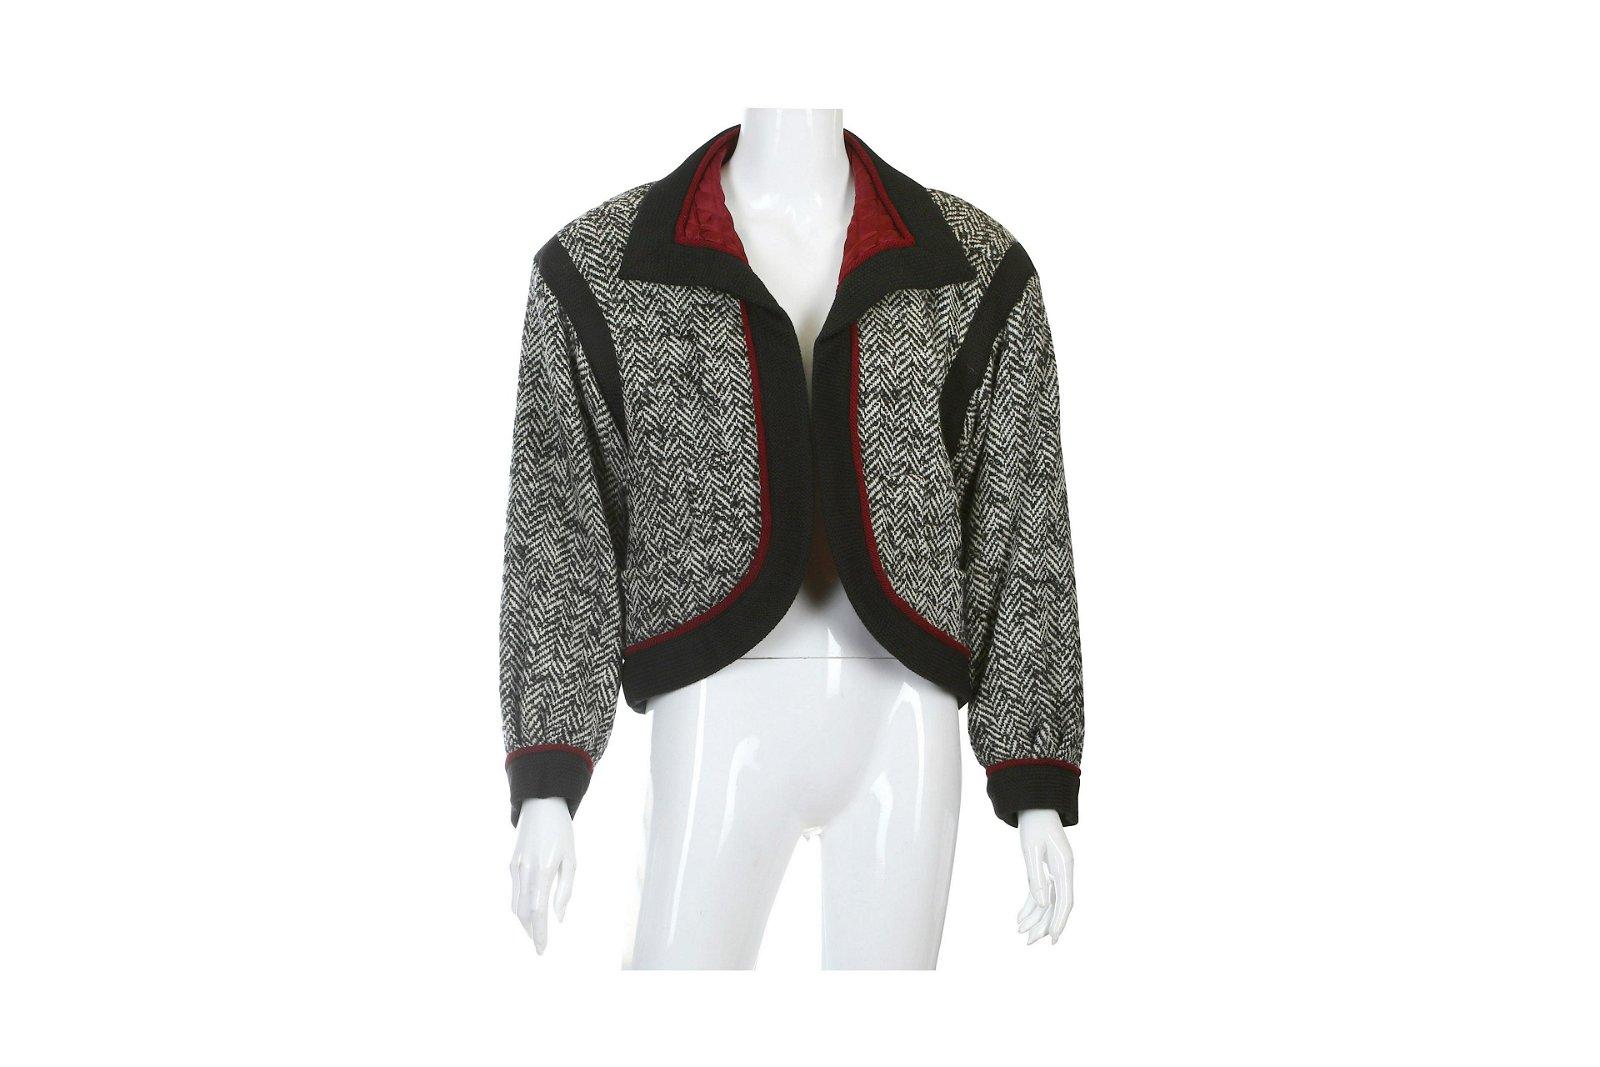 Yves Saint Laurent Black and White Jacket